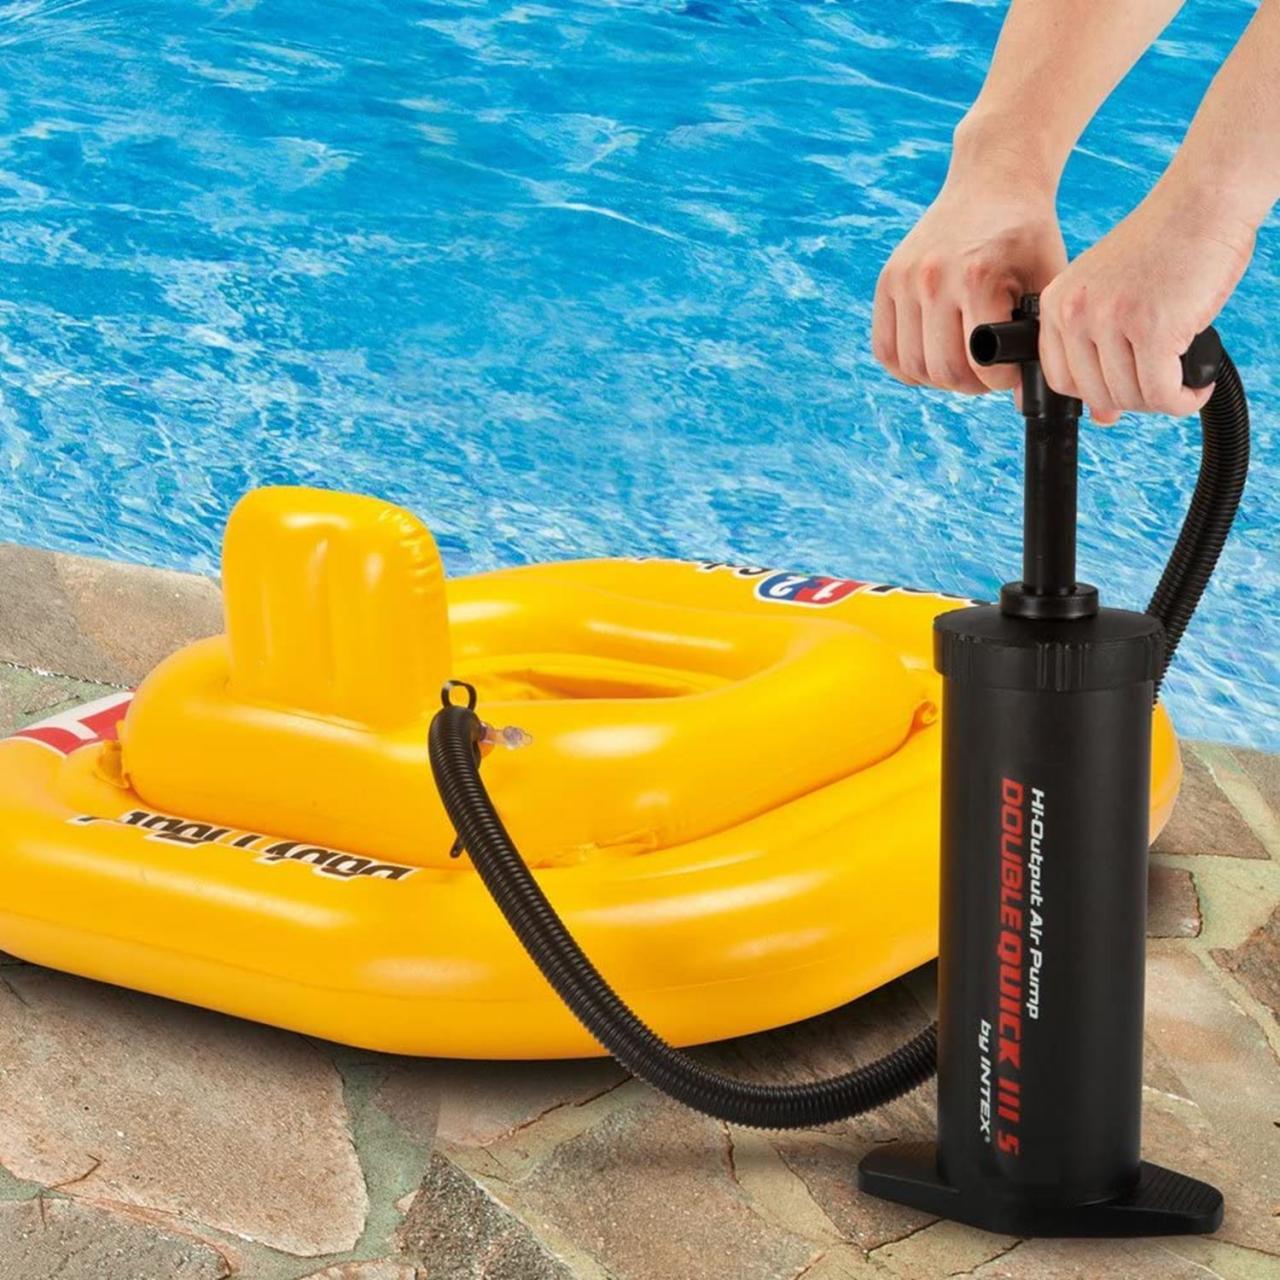 Intex Luftpumpe Doppelhubpumpe Pumpe Handpumpe Pool Luftmatratze Ventile 68605